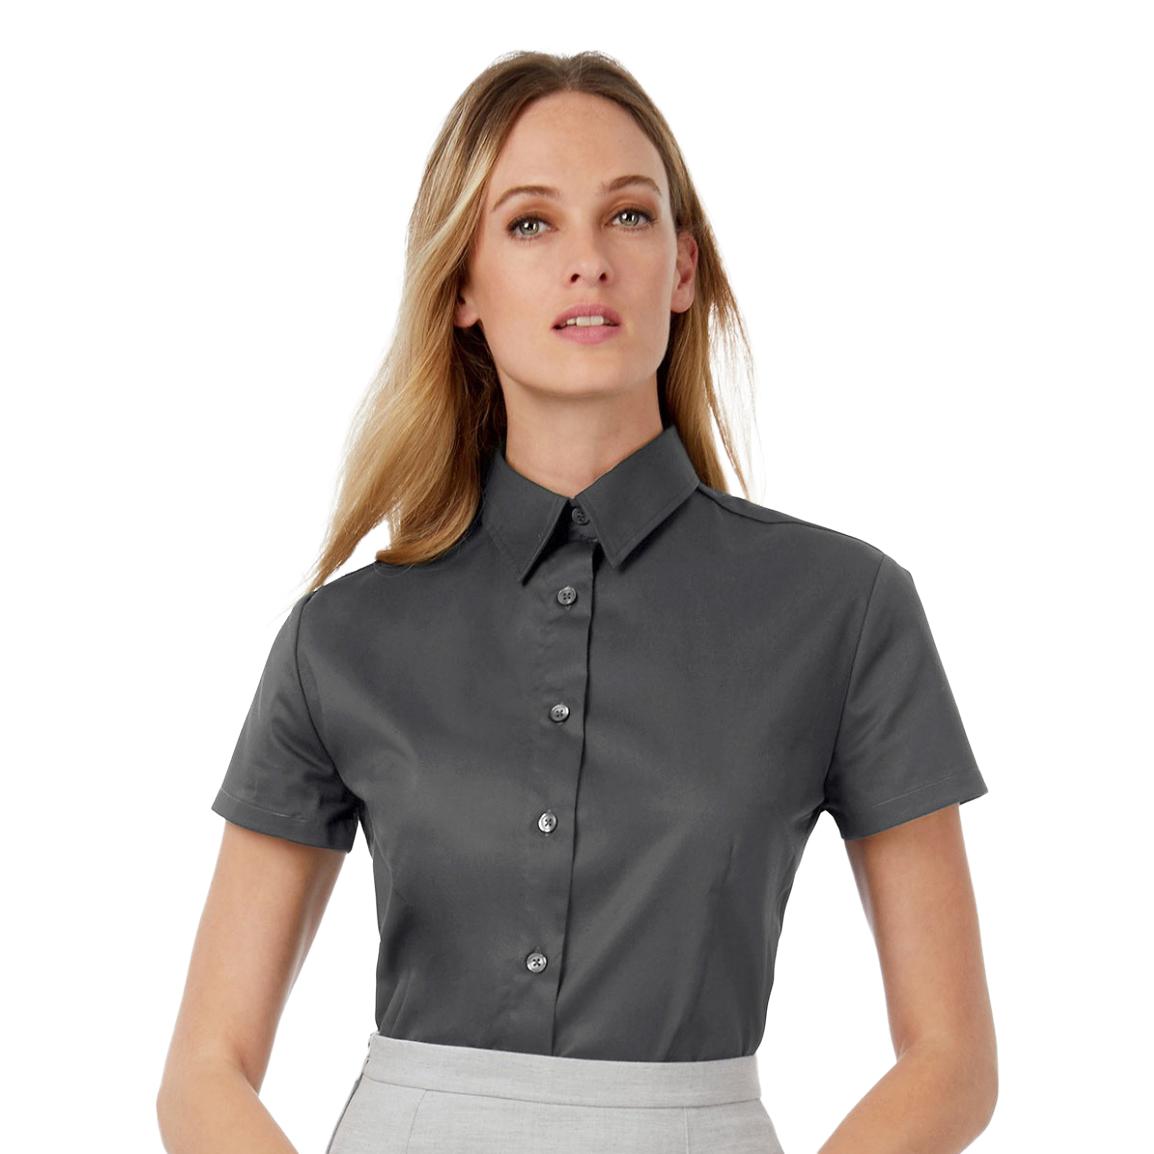 B&C Womens/Ladies Sharp Twill Short Sleeve Shirt (XL) (Deep Red)